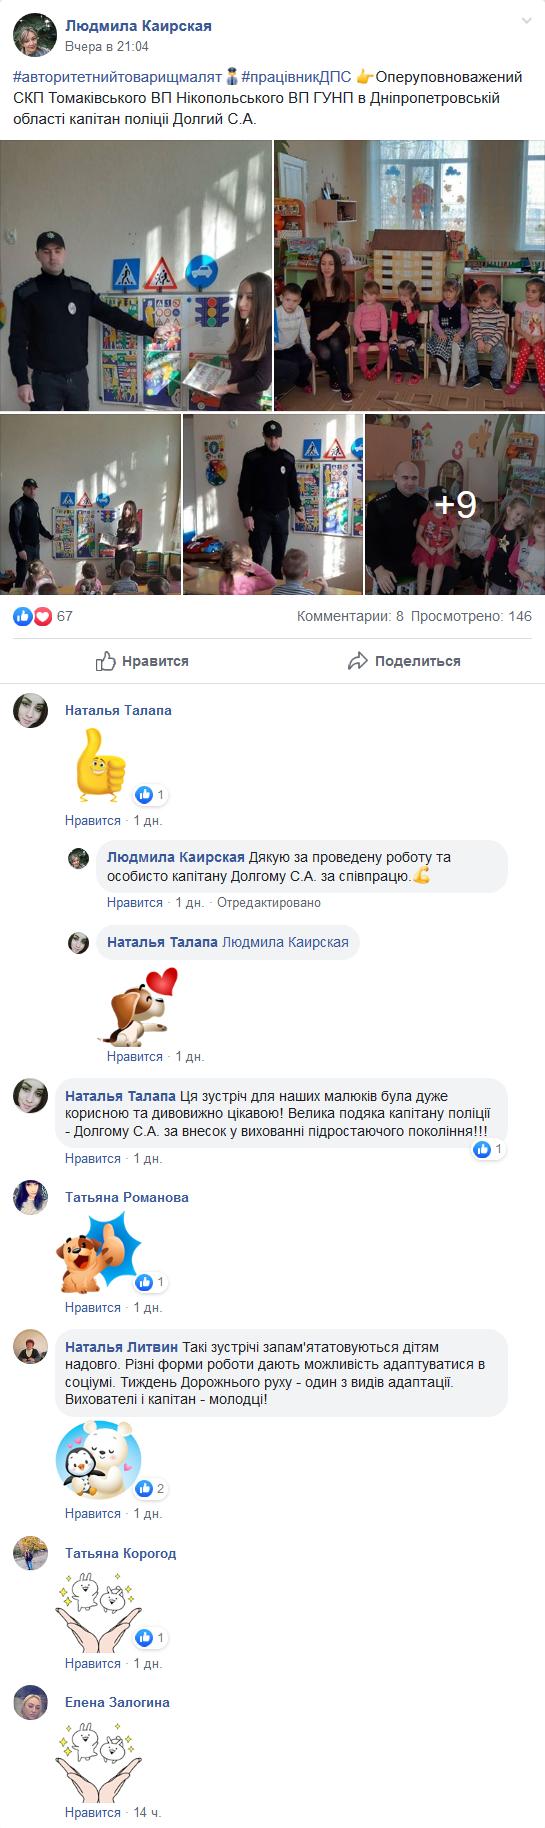 Screenshot_2019-11-16 (3) КДНЗКТ № 2 КУЛЬБАБКА .png